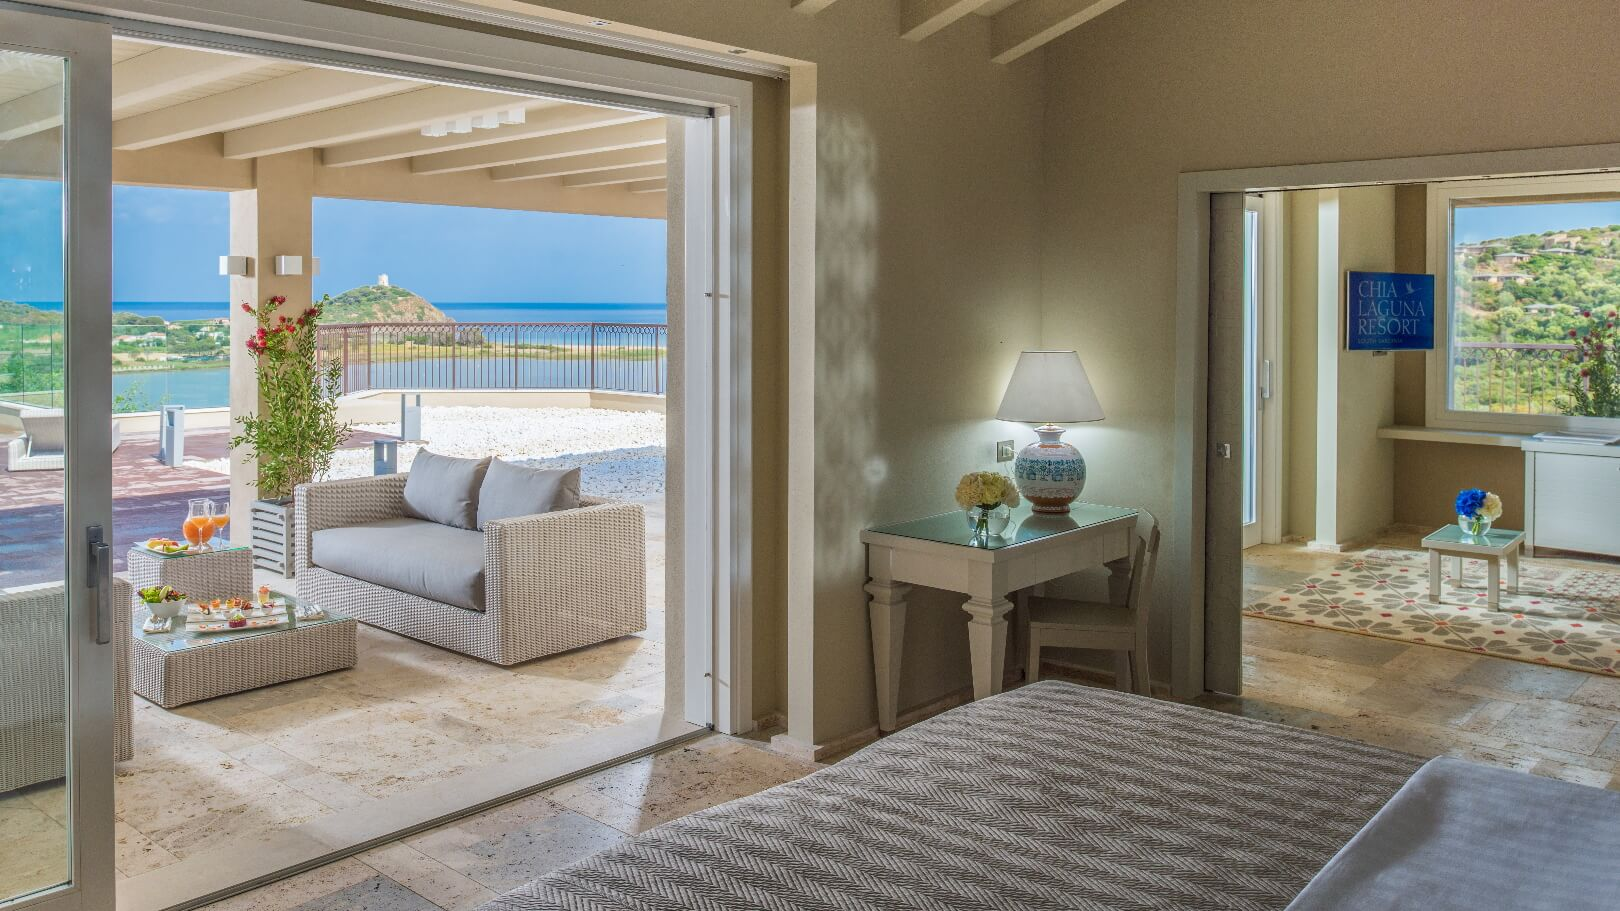 https://www.chialagunaresort.com/wp-content/uploads/2021/04/IHC_Chia-Laguna-Resort_grid_CL4U_terrace-suite.jpg